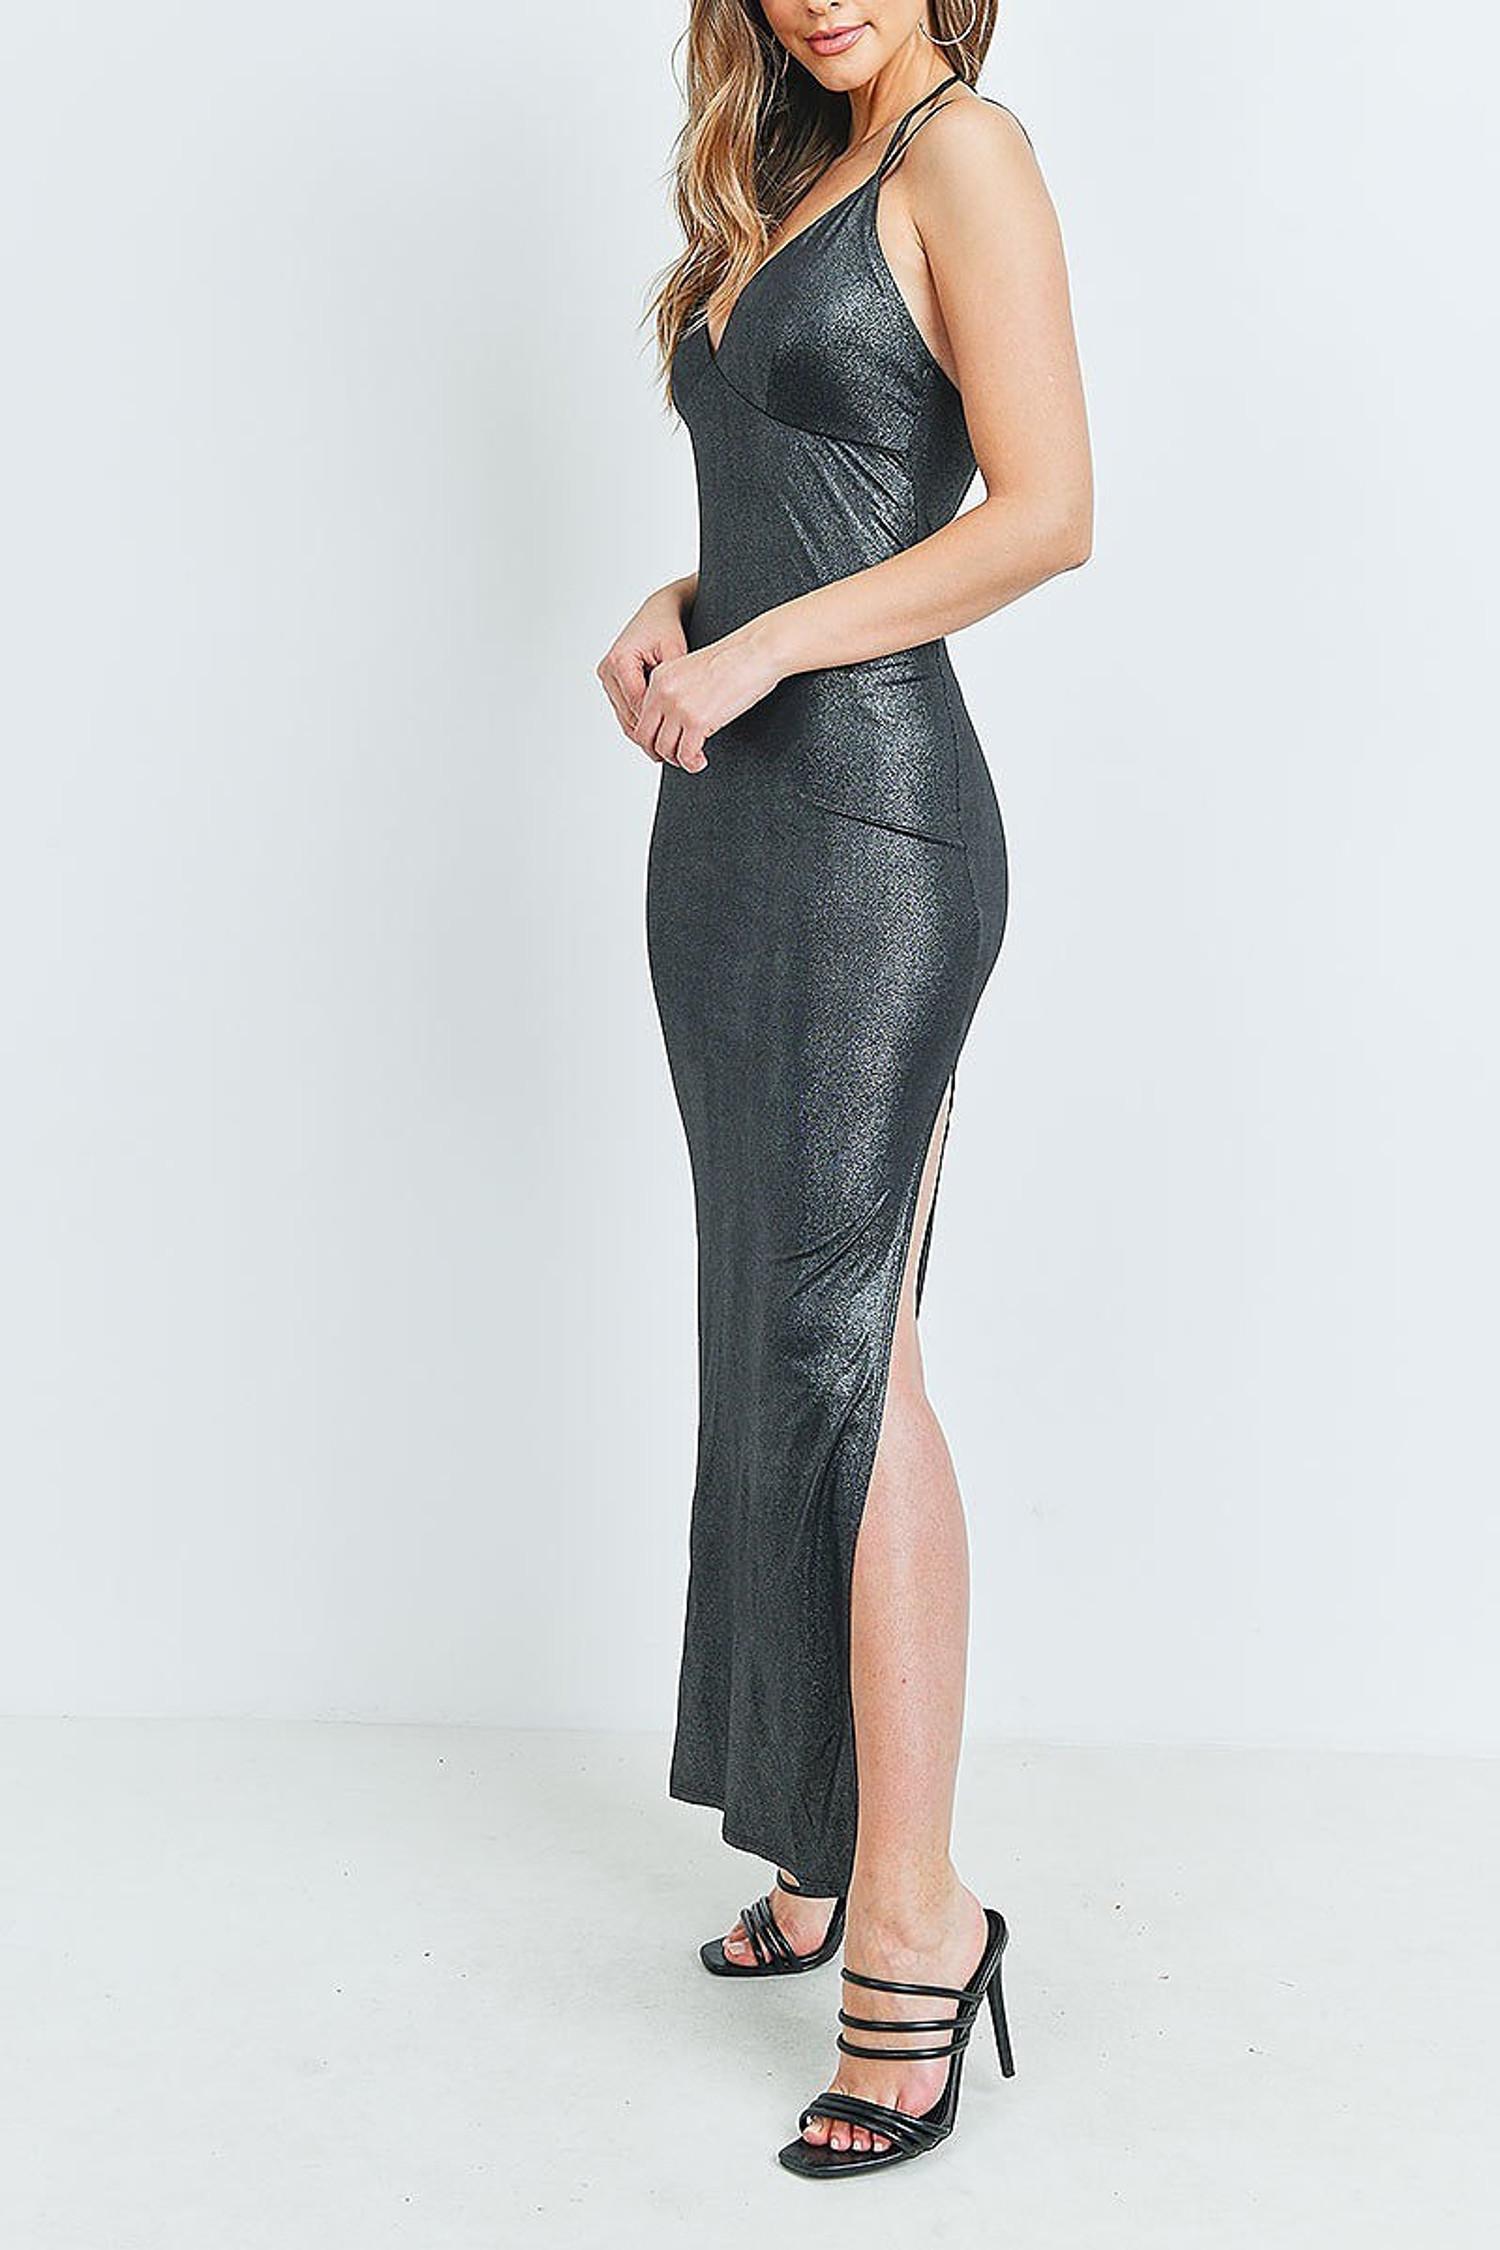 Black Metallic Side Slit Halter V Neck Bodycon Maxi Dress